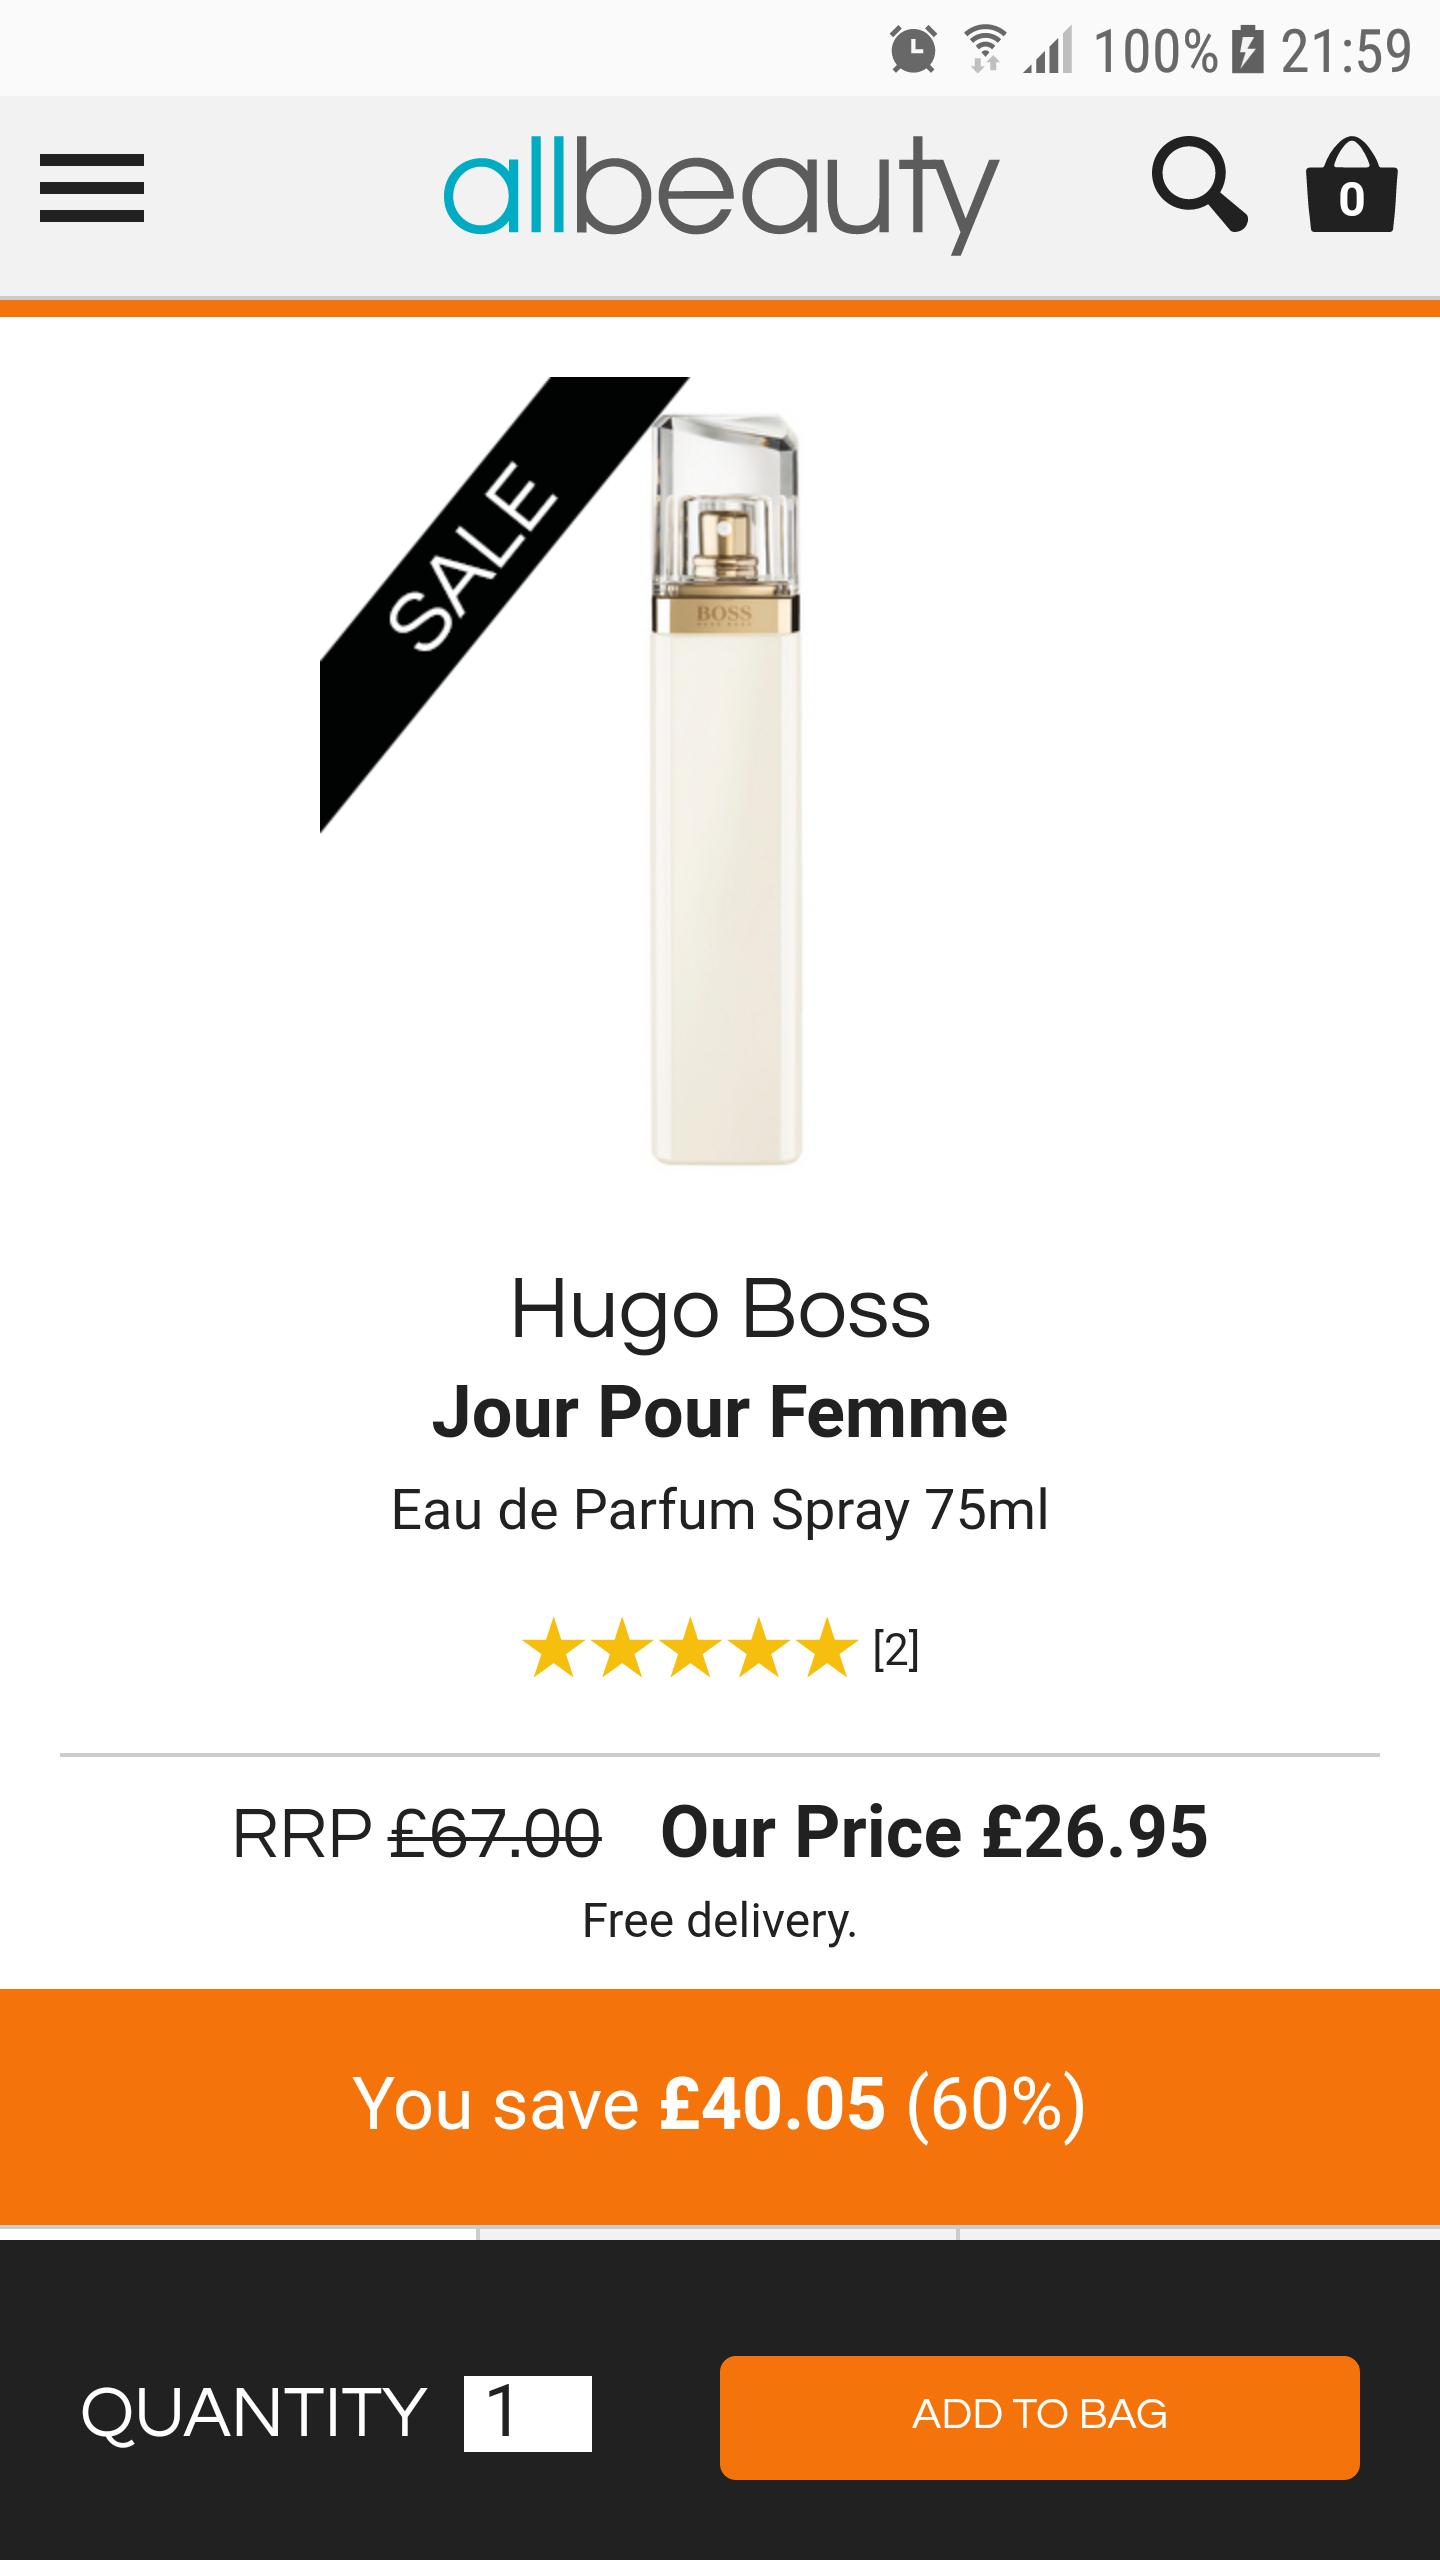 Allbeauty. Hugo Boss Jour Pour Femme Eau de Parfum Spray 75ml - £26.95 @ All Beauty